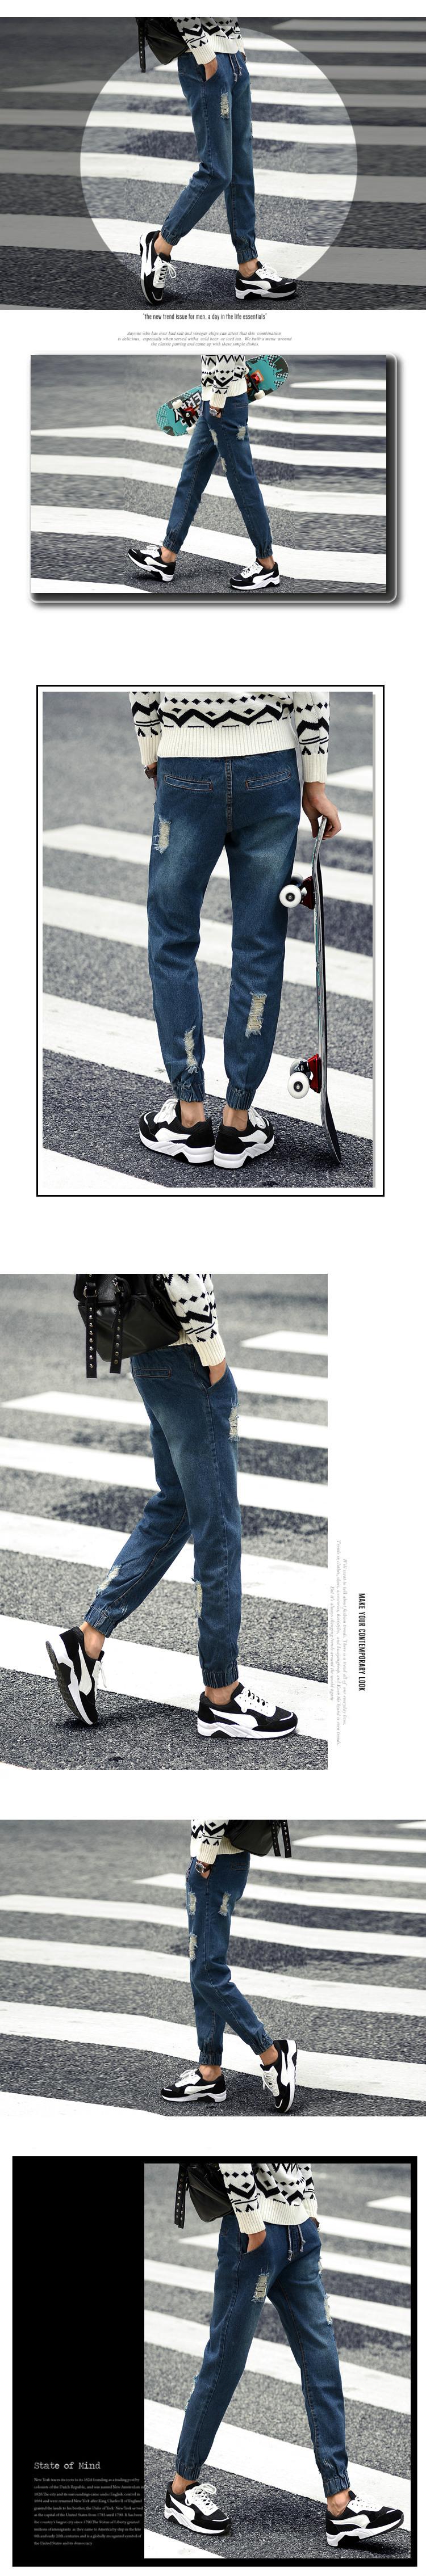 2016 New Pants Haren Korean Fashion Men's Jeans Pants Feet Feet